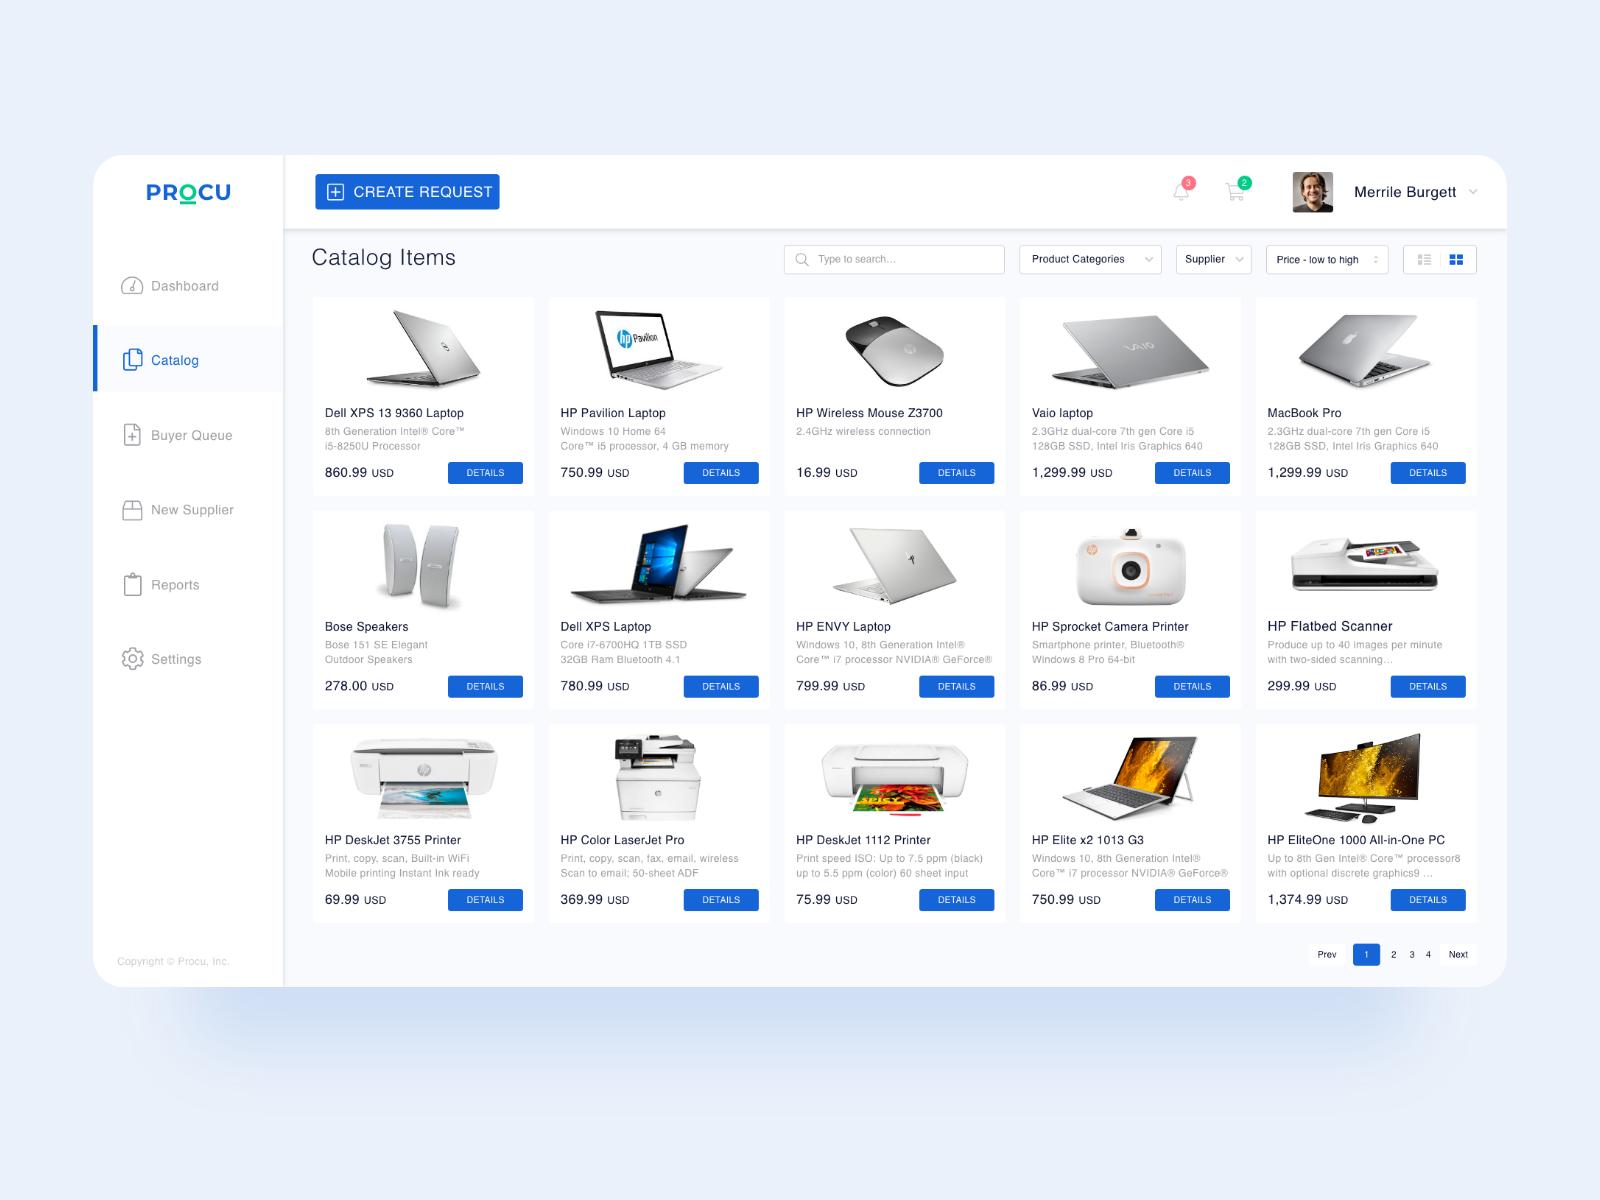 Procurement Dashboard Free Download In 2020 Dashboard Design Procurement Dashboard